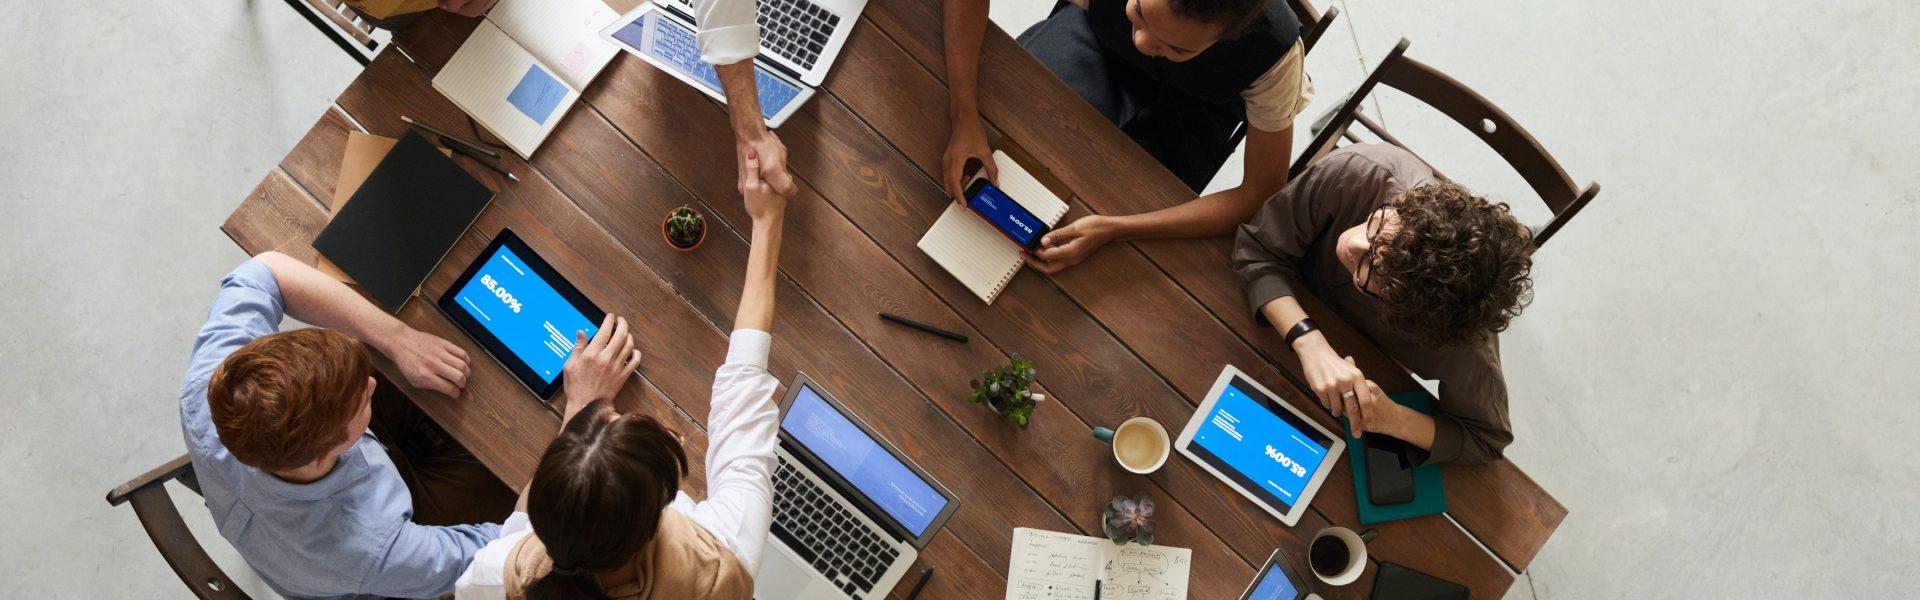 Antreprenor participând la intalnire de echipă